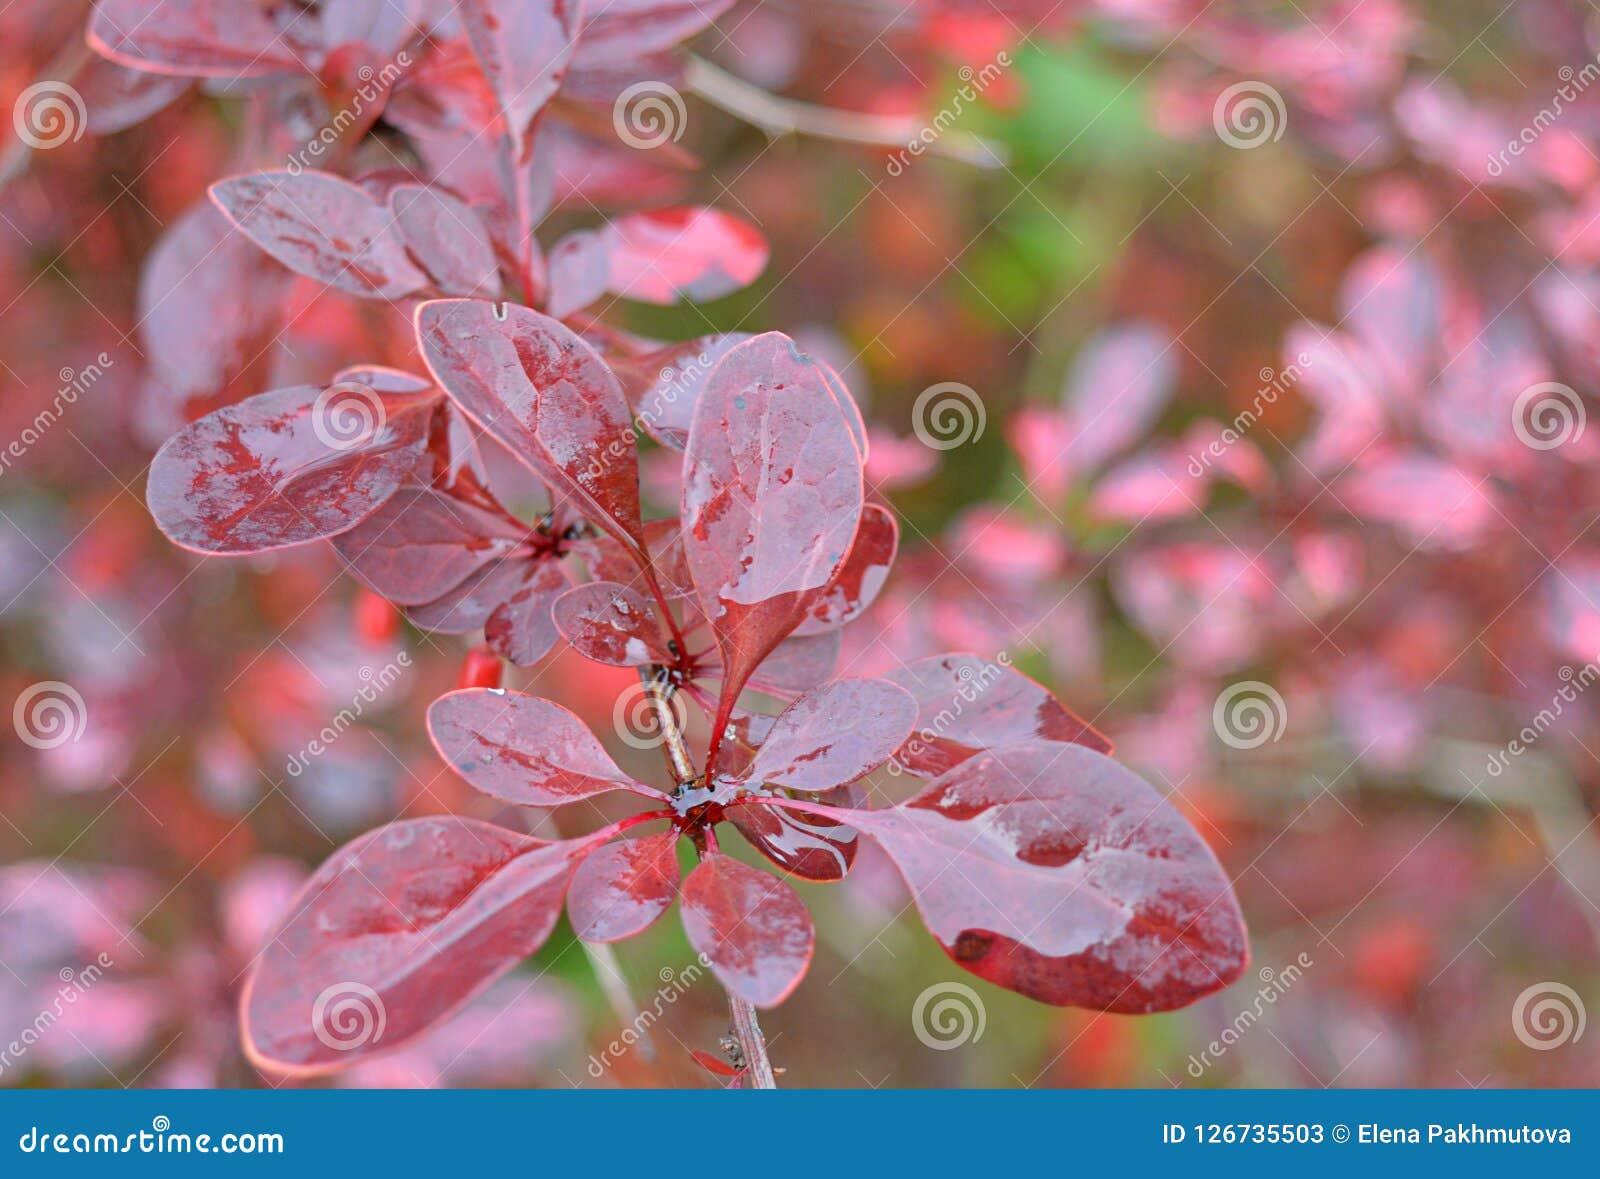 Fleur Nature Rose Ressort Fleur Fleurs Usine Jardin Vert